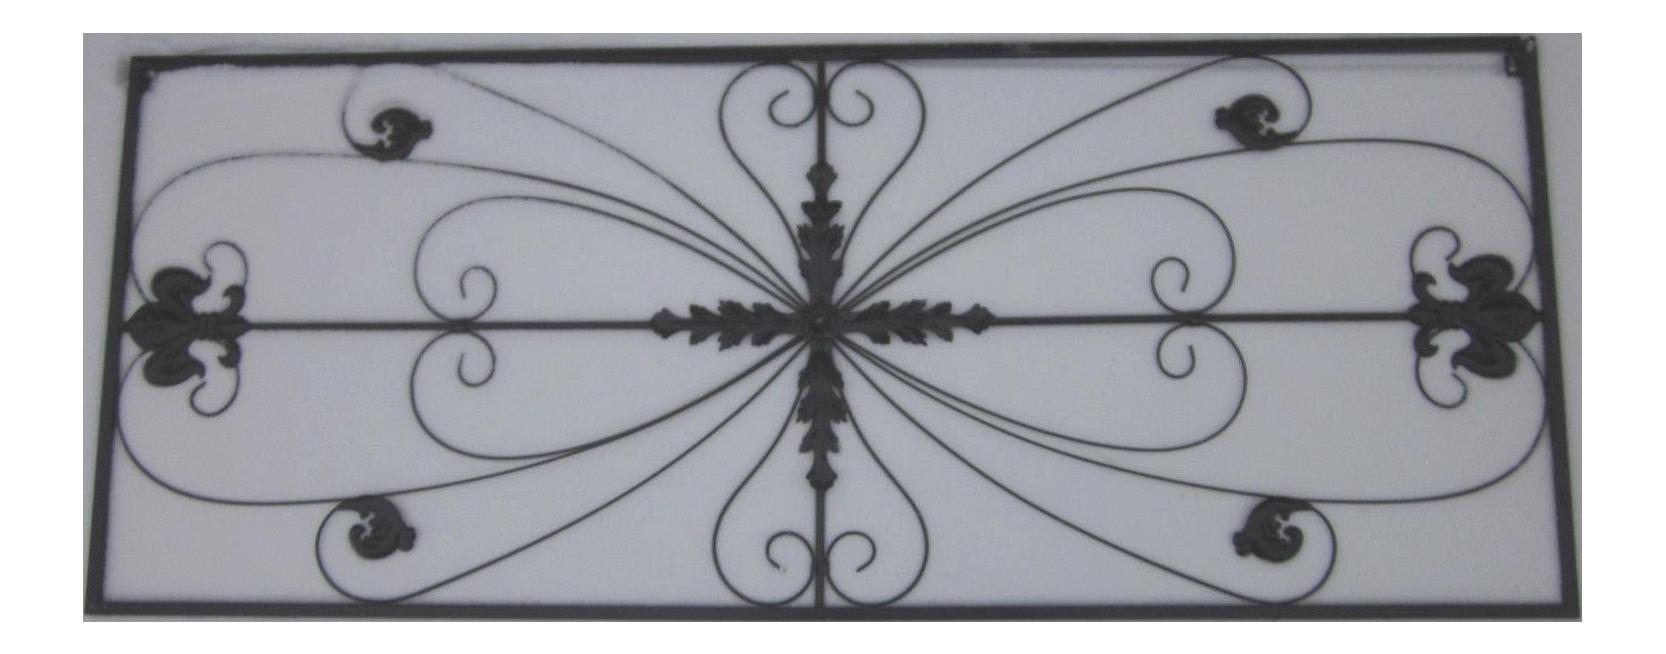 metal grille fleur de lis ornamental panel chairish With kitchen cabinet trends 2018 combined with fleur de lis metal wall art